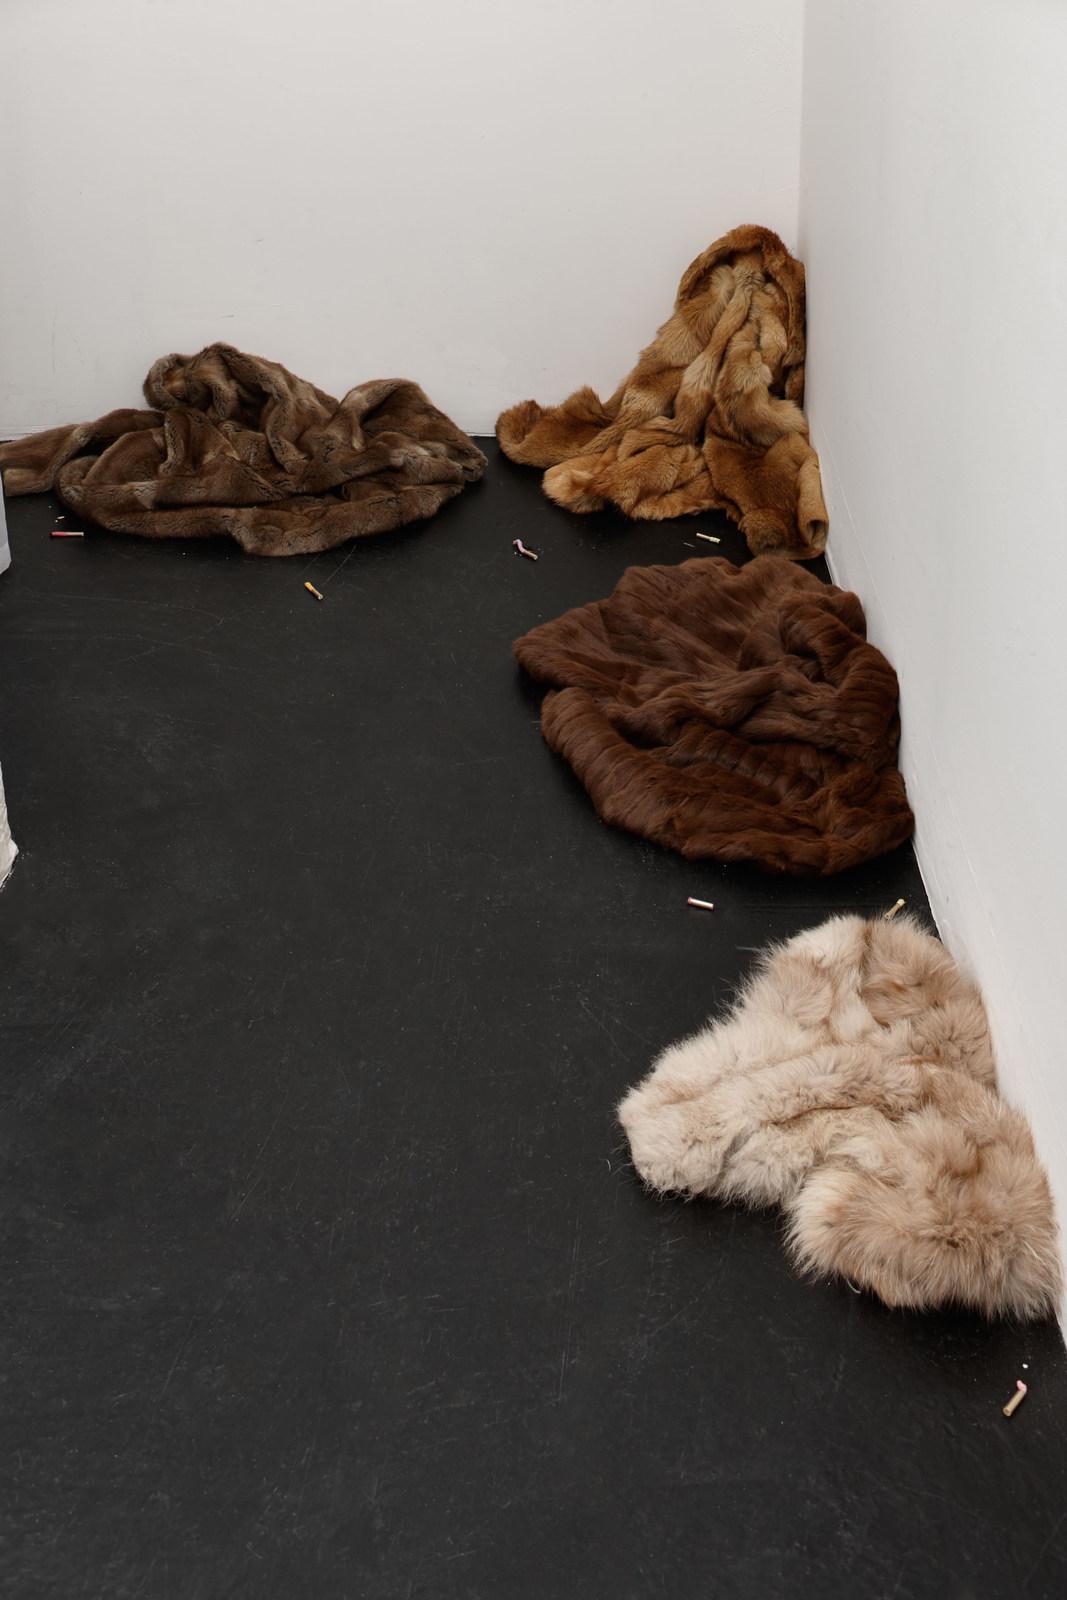 Zoe Williams - Pel remnants (Smoking in Furs) (Detail), 2016